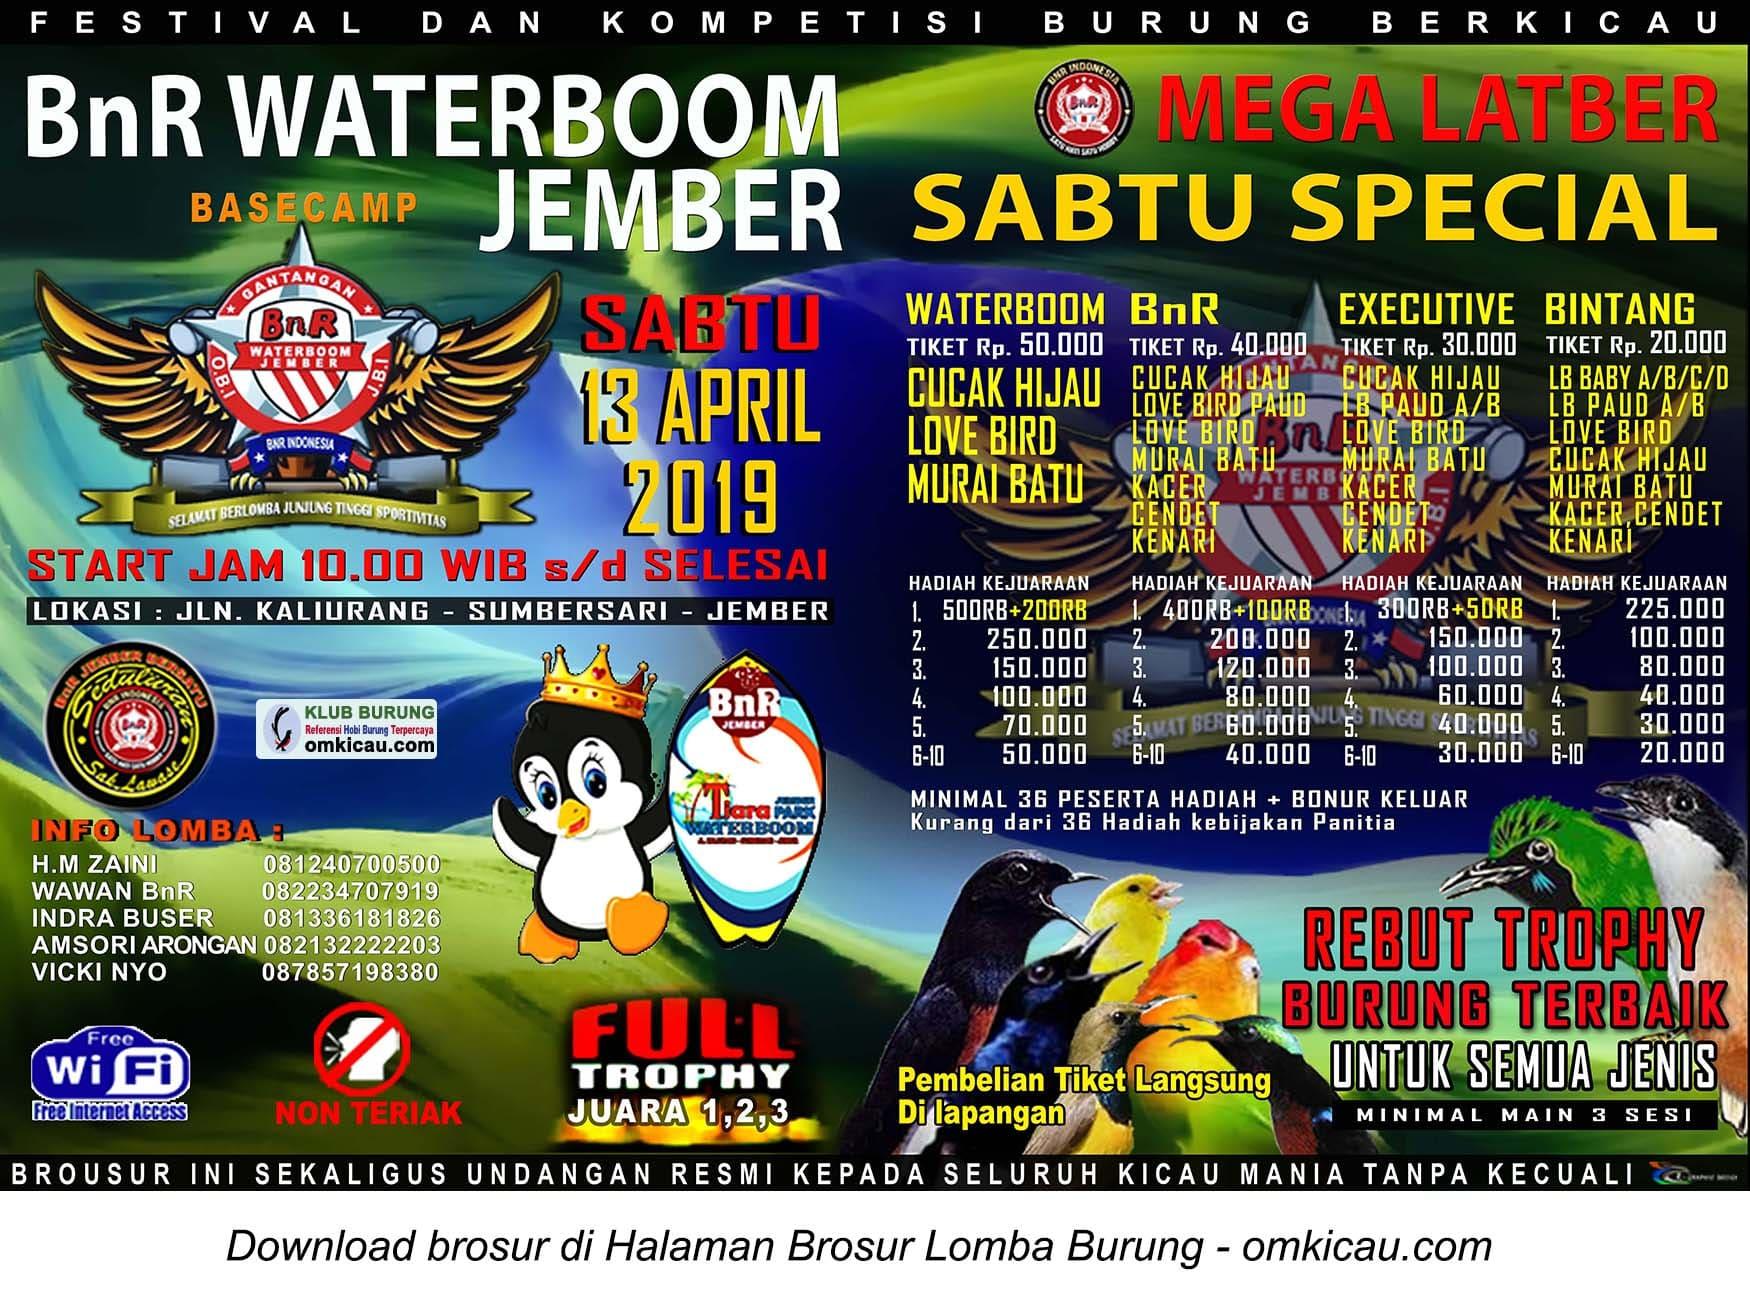 Mega Latber Sabtu Special